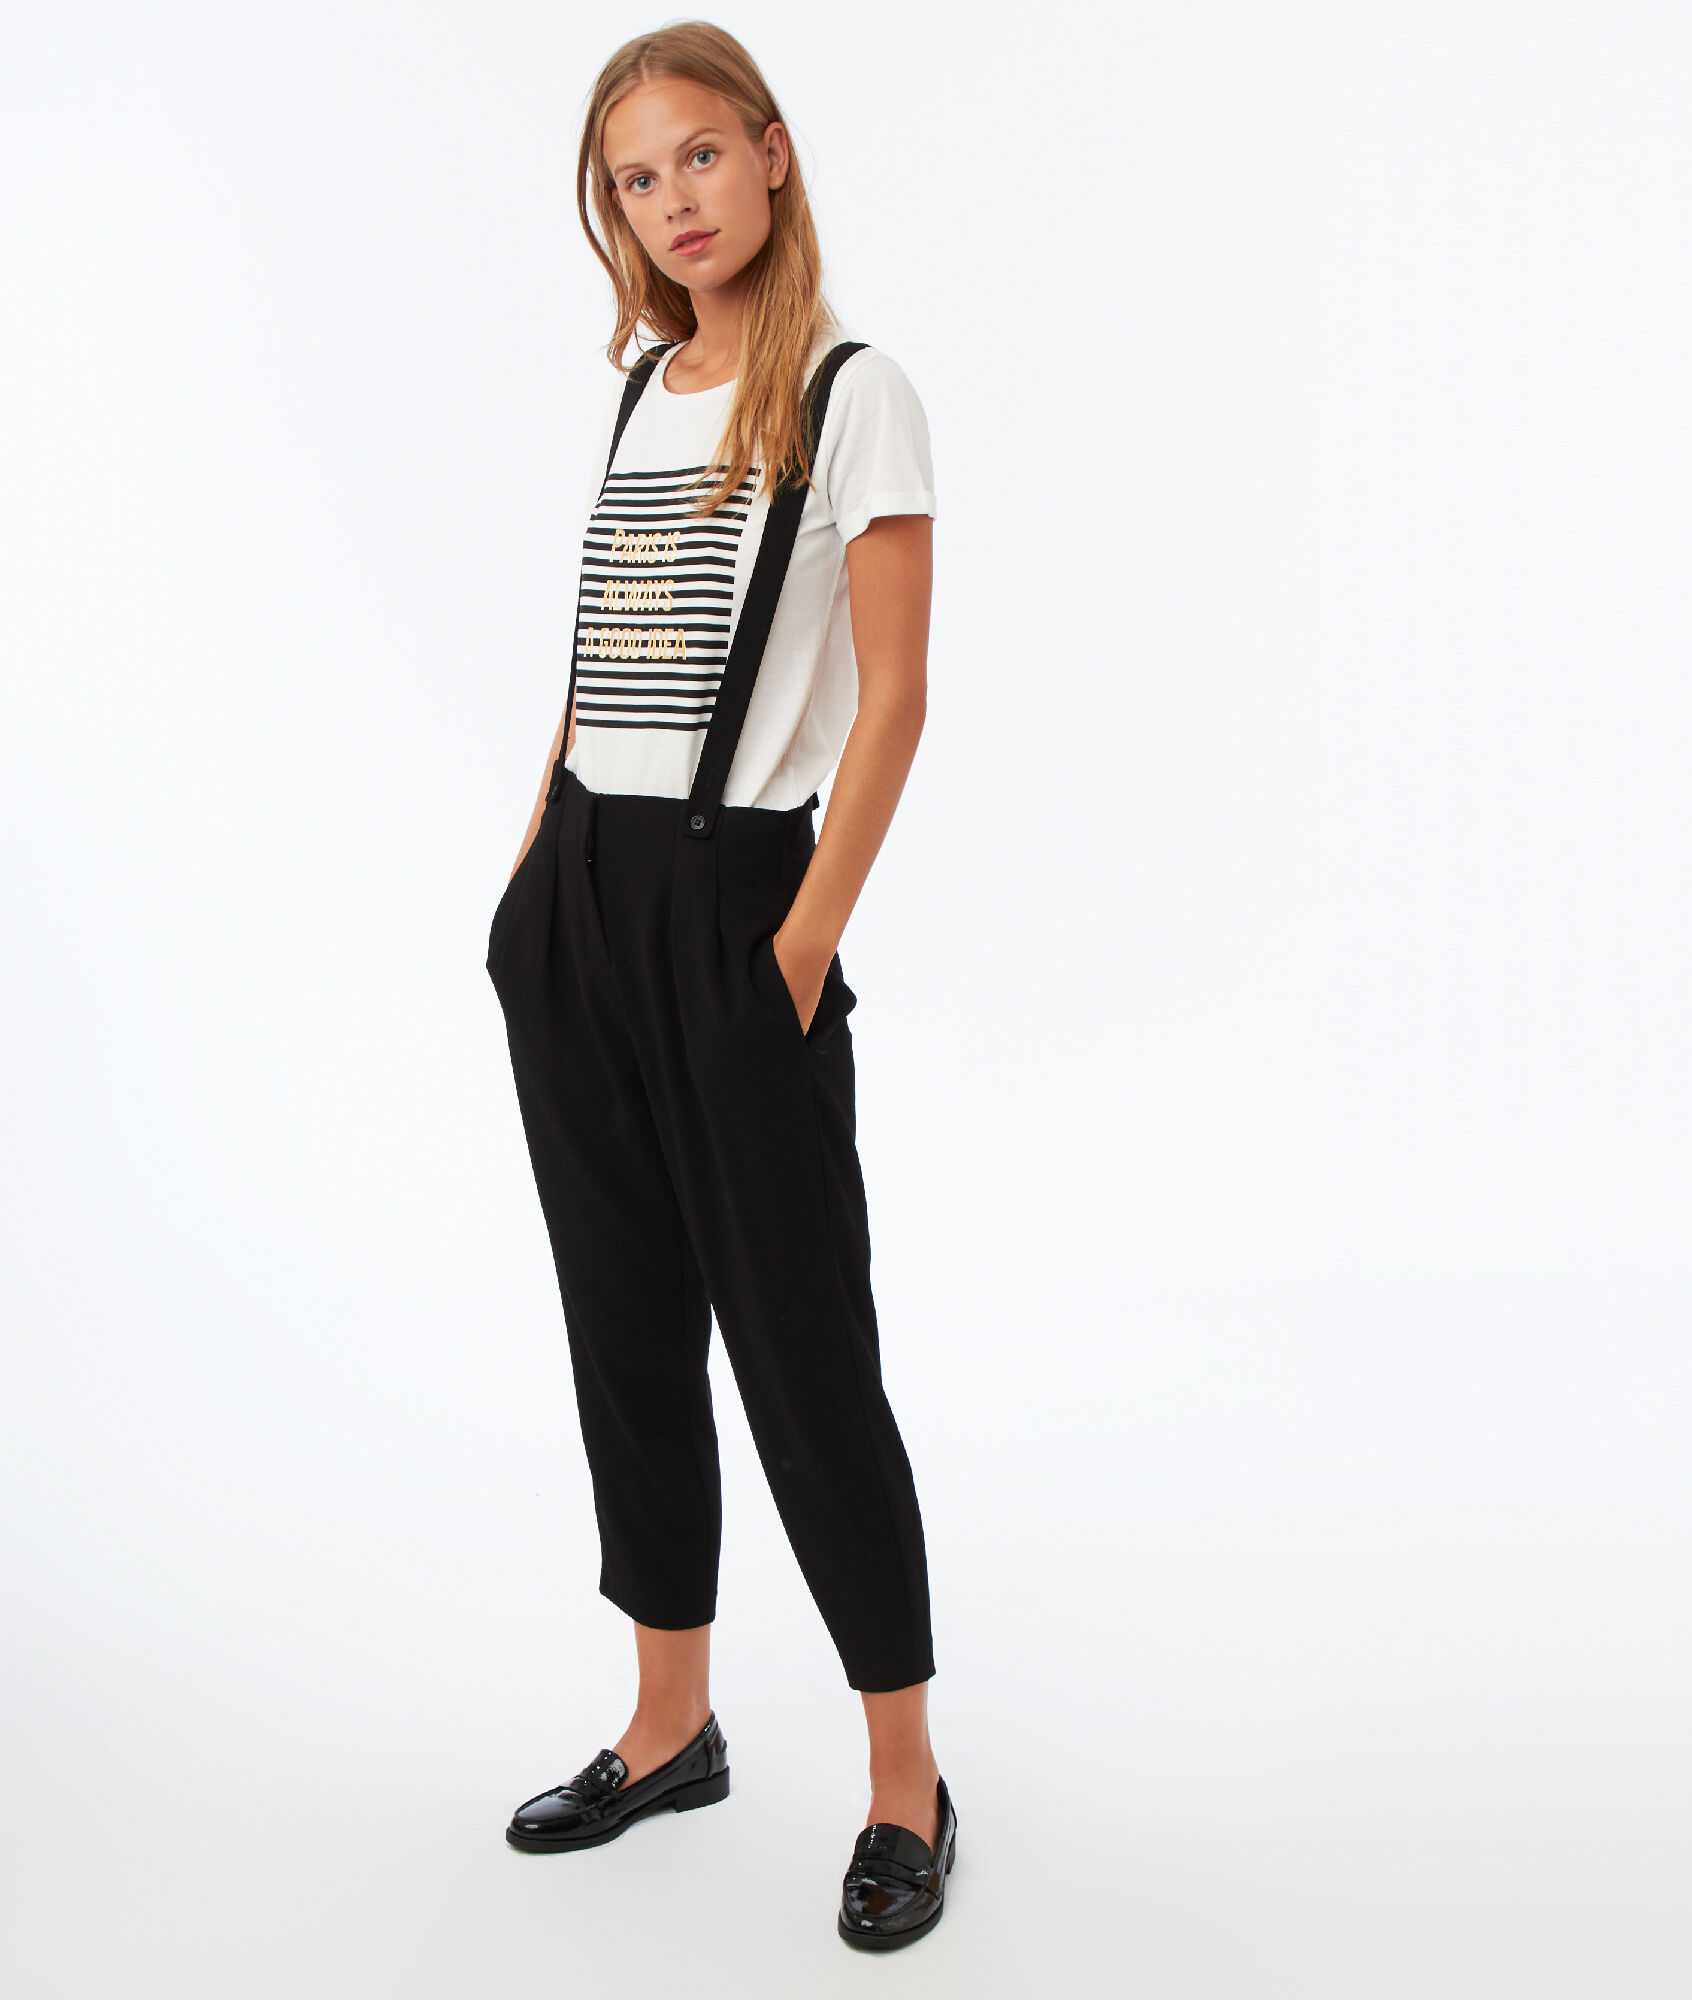 pantalon bretelles amovibles taille haute stripa noir. Black Bedroom Furniture Sets. Home Design Ideas